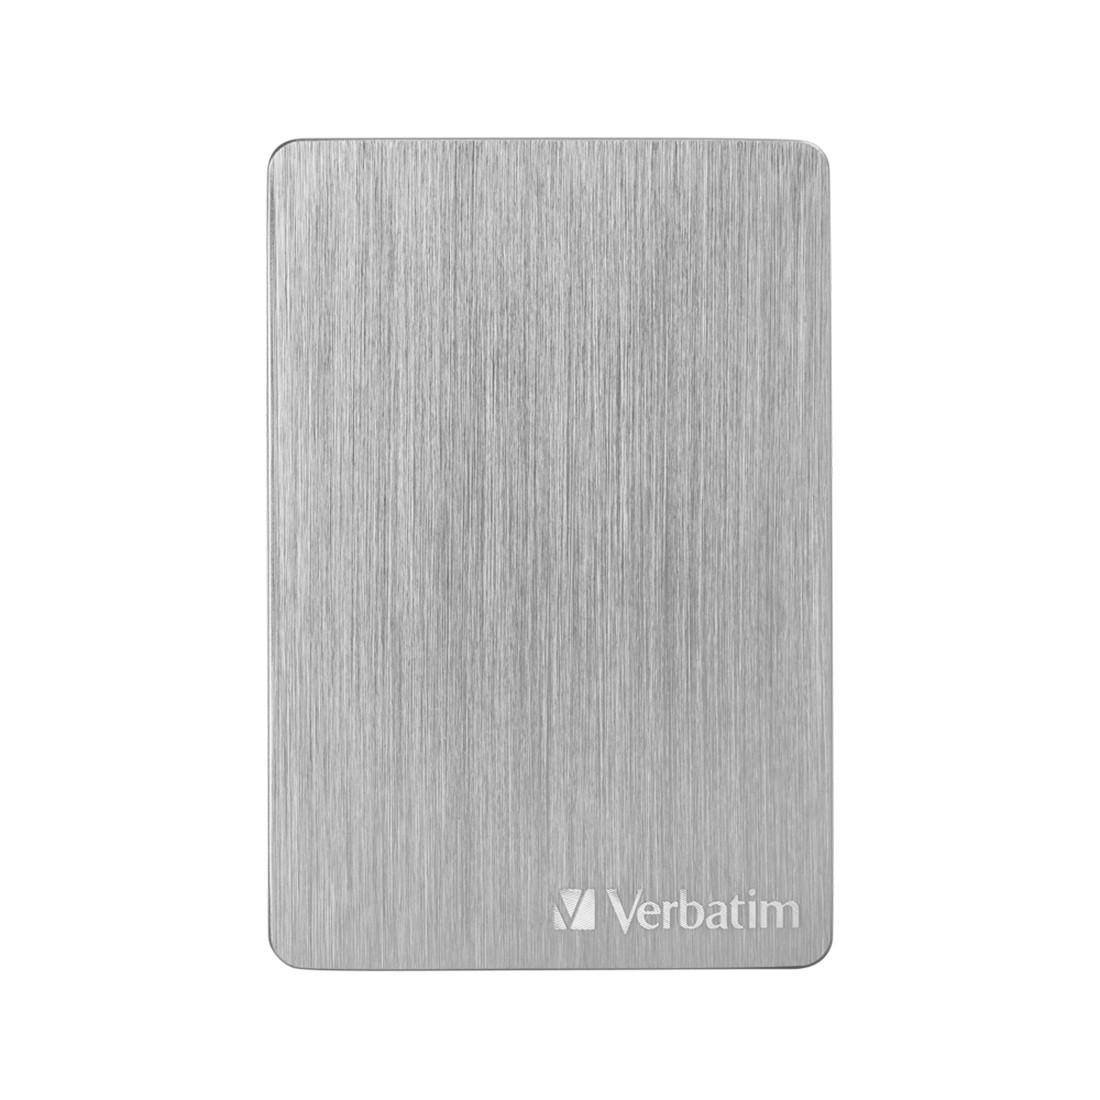 "Внешний жёсткий диск, Verbatim, 53663, 1TB, 2.5"", USB 3.2, Серебристый"